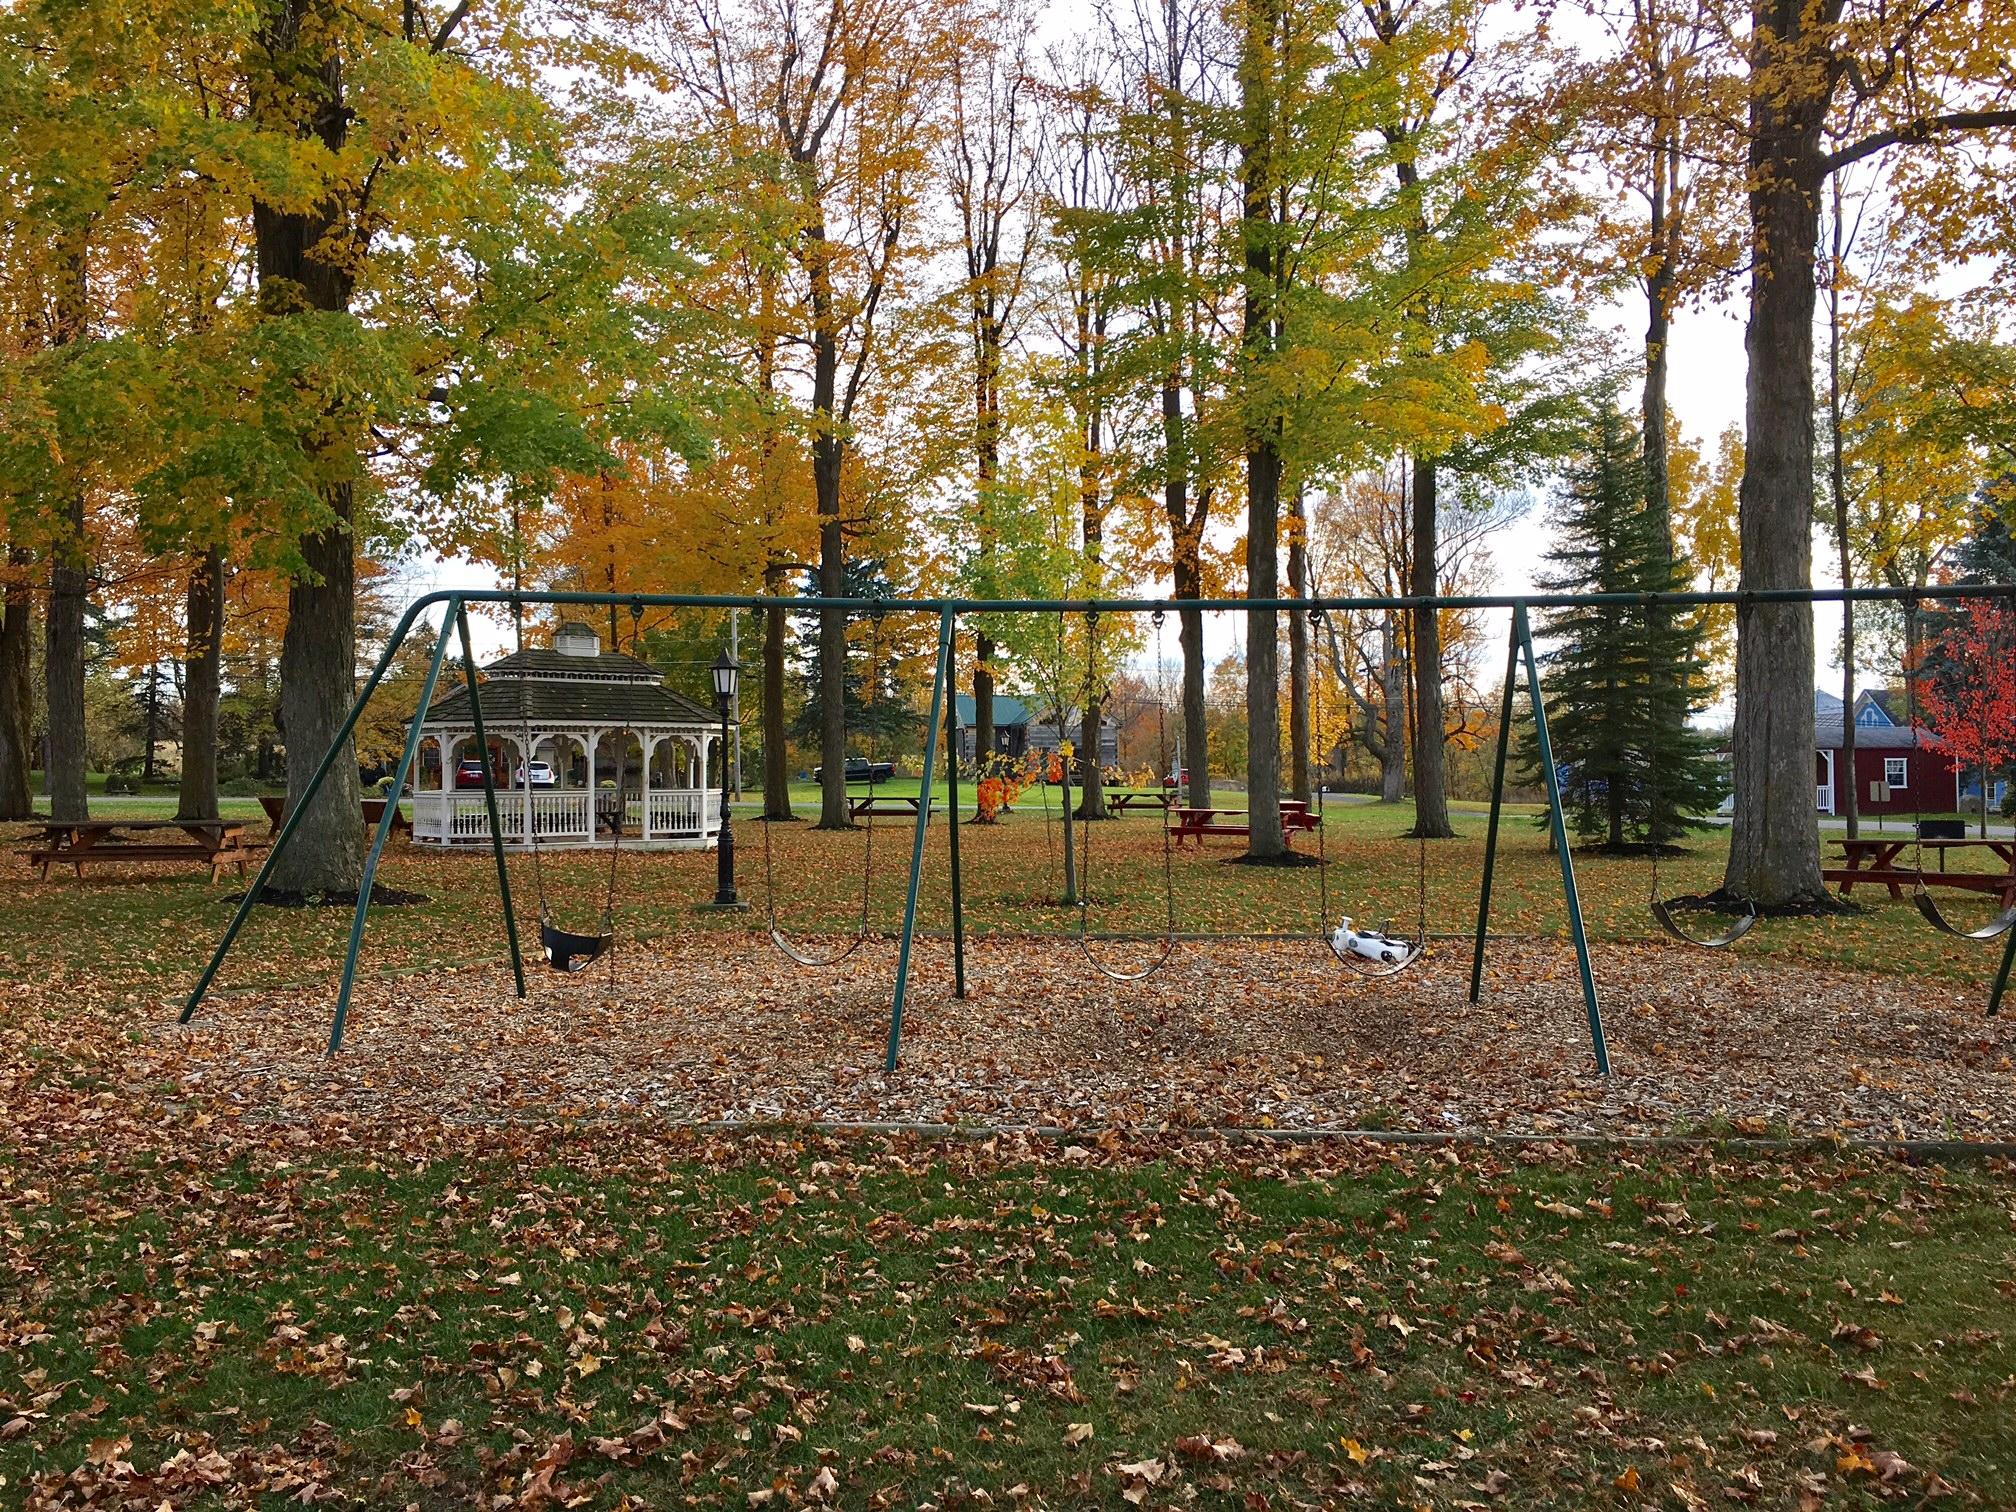 Hopkinton swings1 (1).jpg